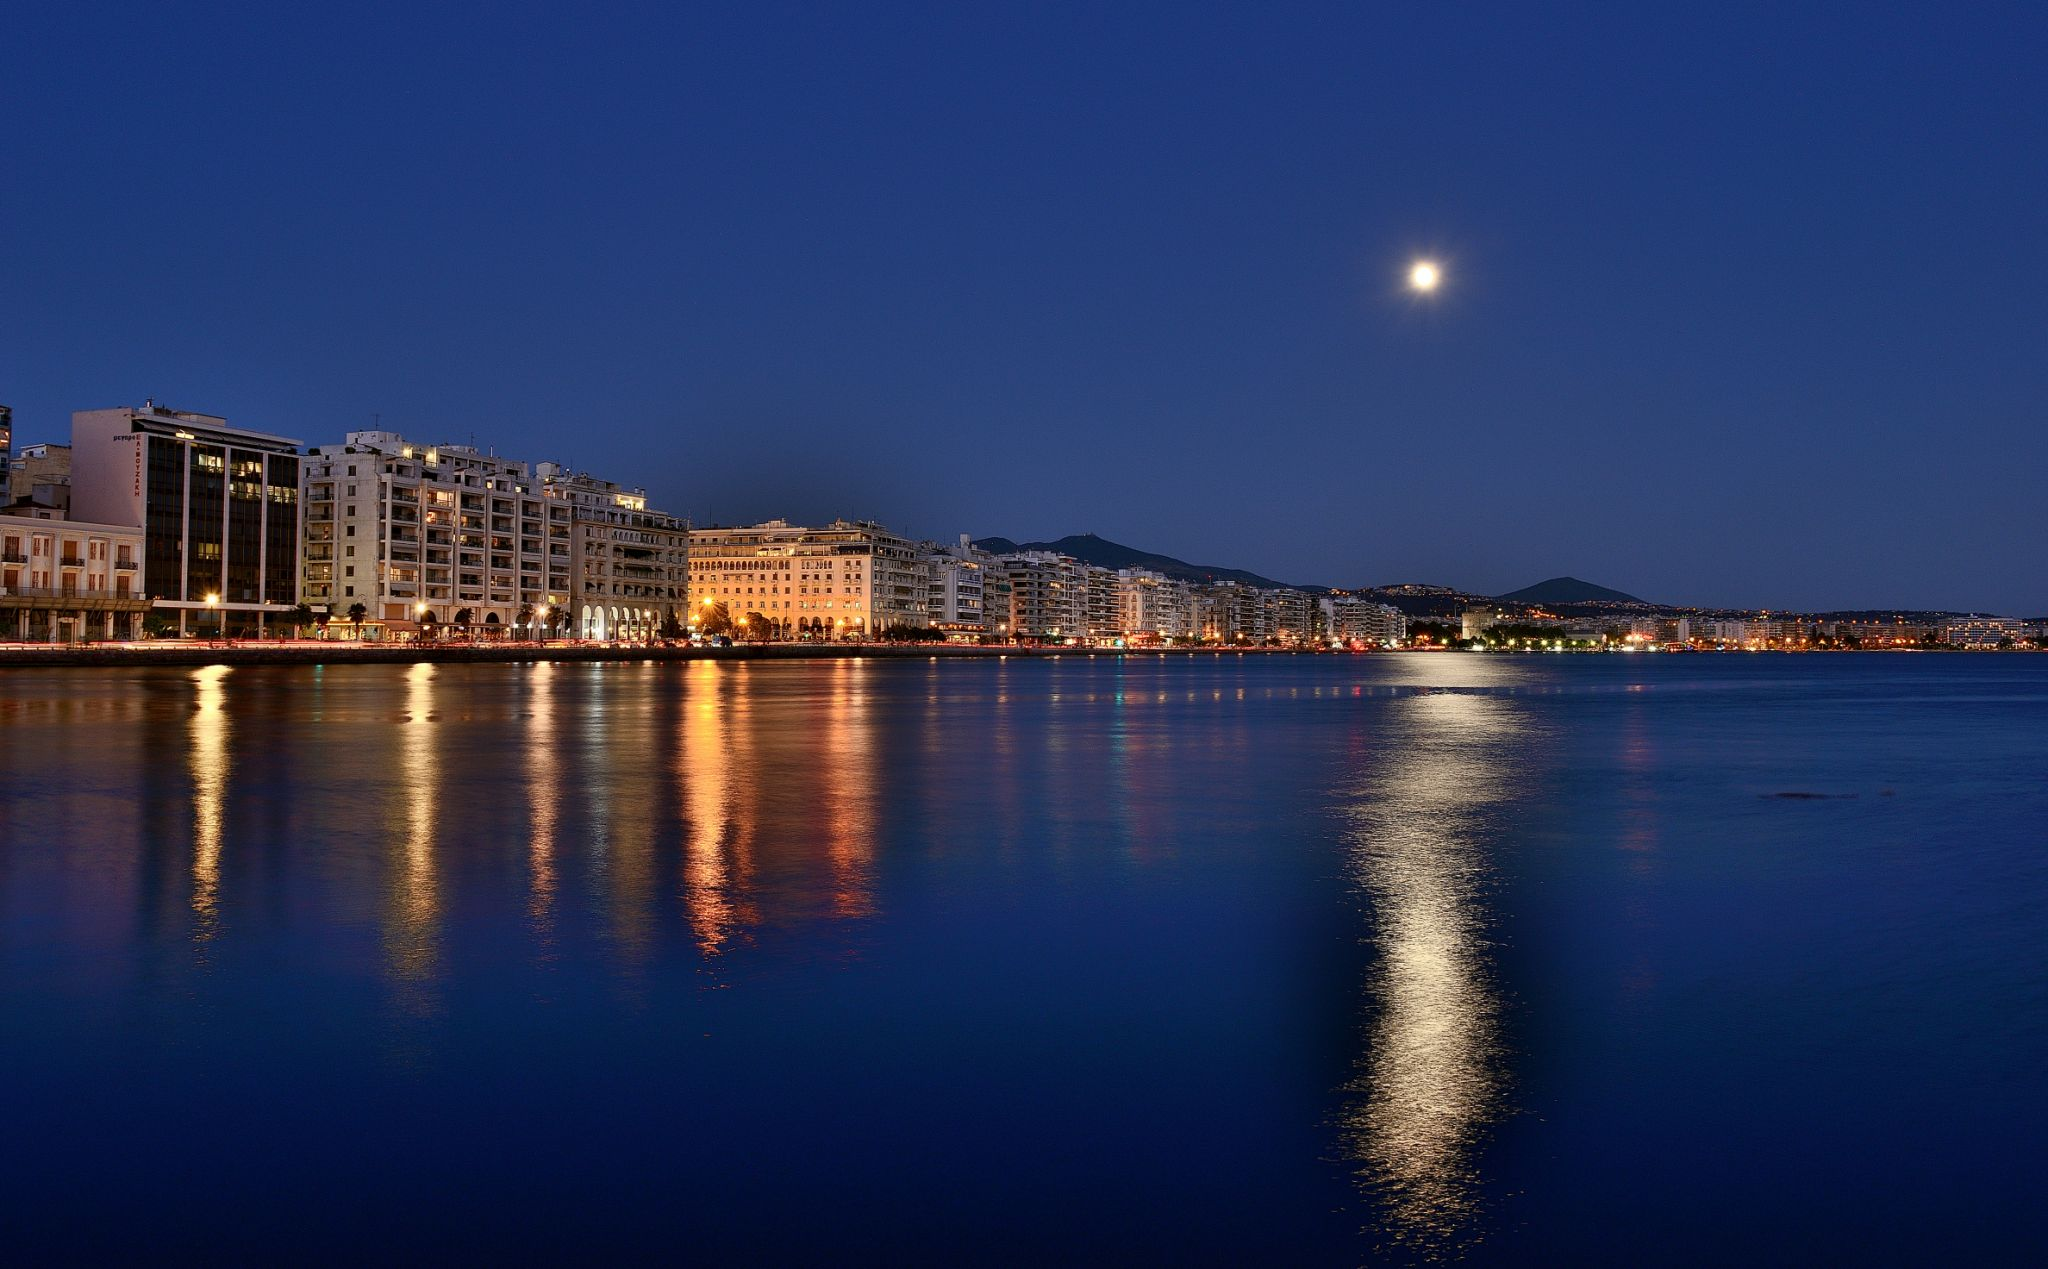 Thessaloniki Coastline and Promenade, Greece